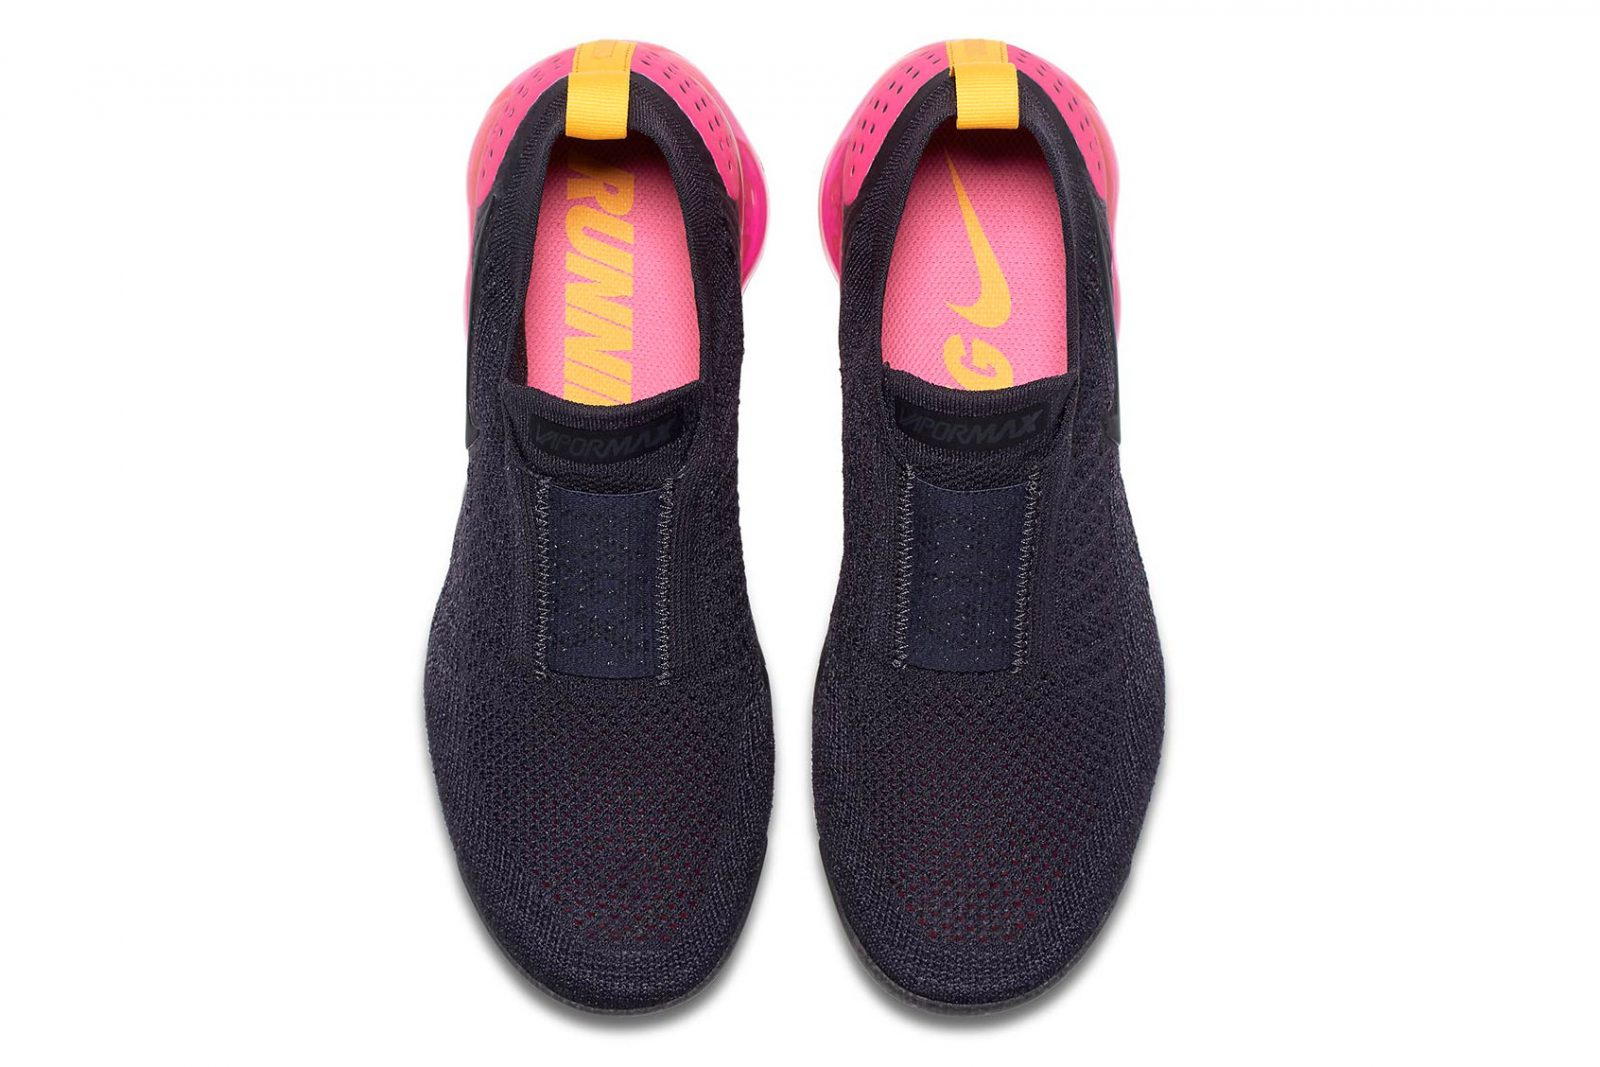 Nike Air VaporMax Moc 2 Pink Blast | AJ6599-001